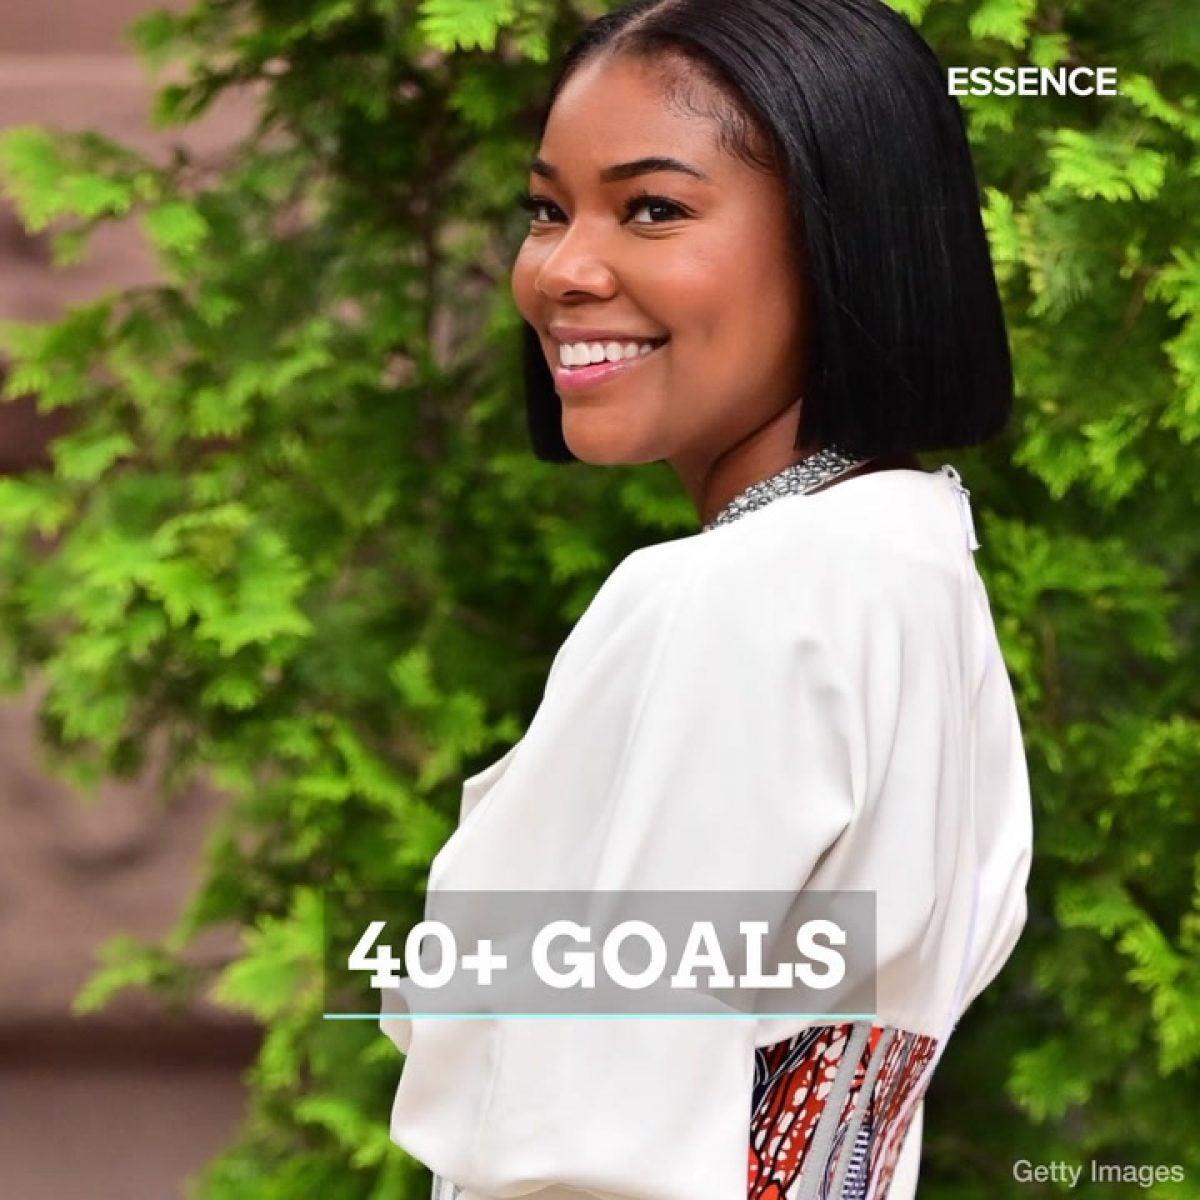 40+ Goals